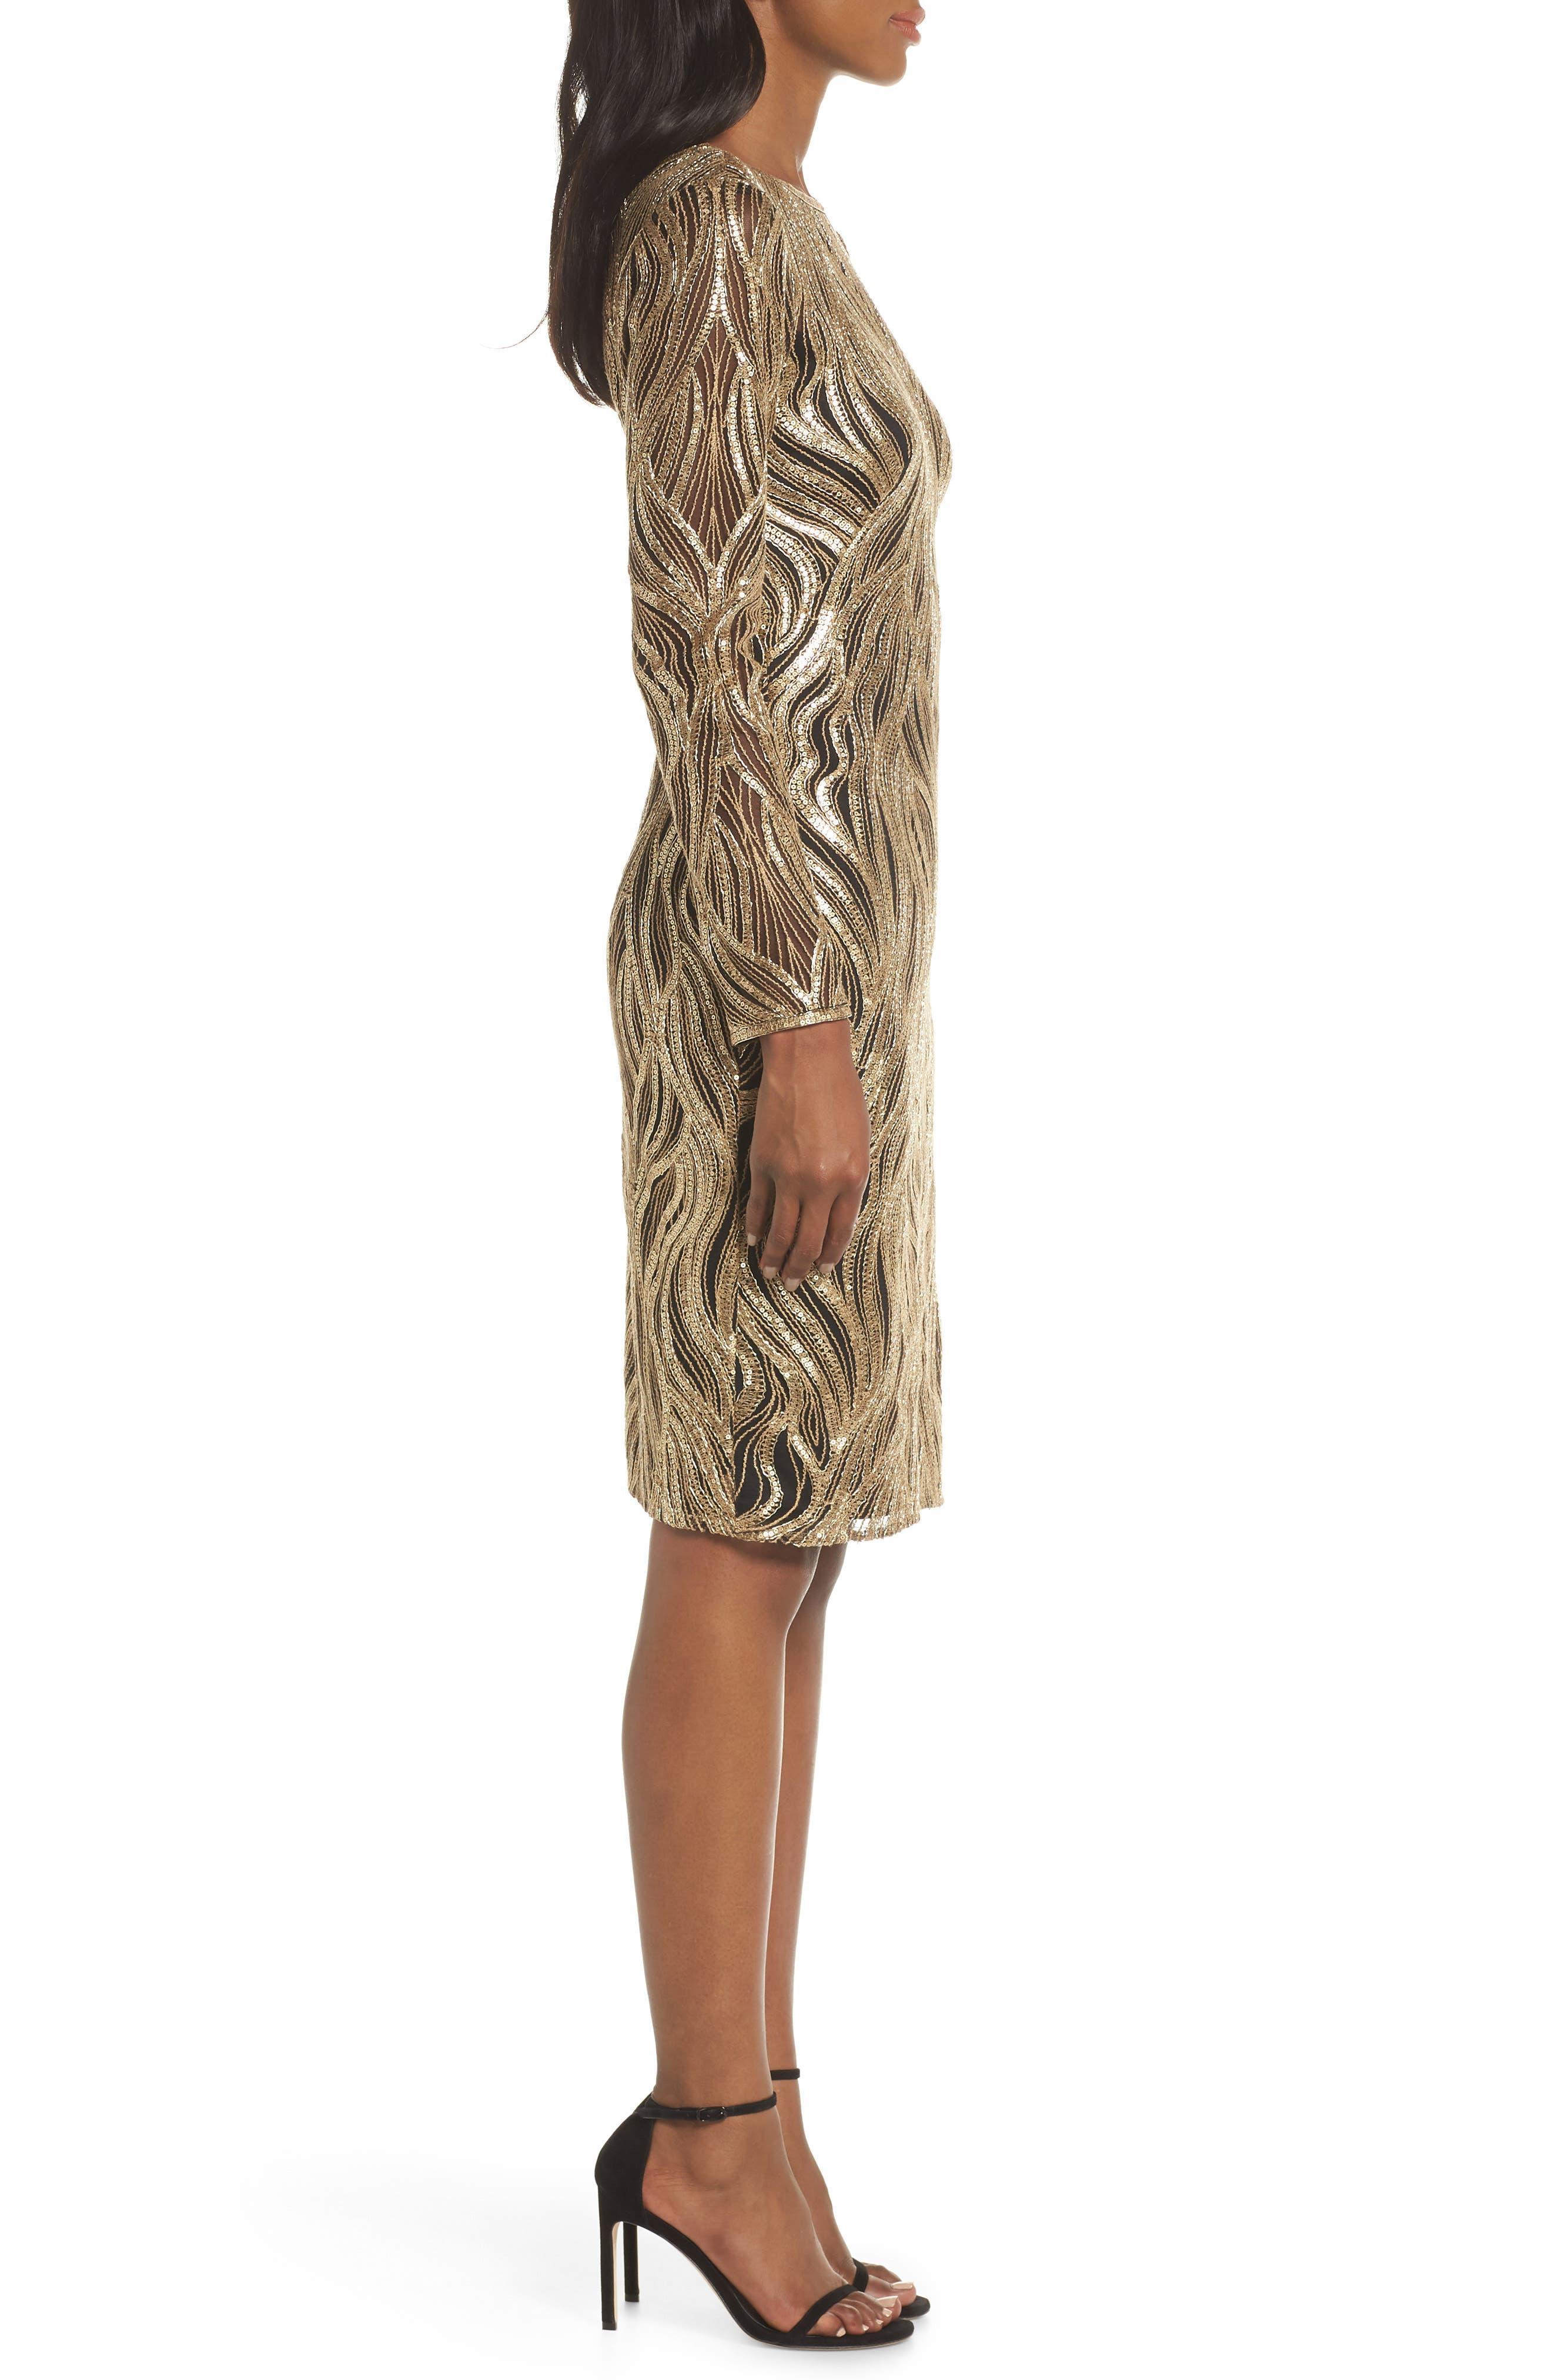 TADASHI SHOJI, Long Sleeve Sequin Mesh Cocktail Dress, Alternate thumbnail 4, color, GOLD/ BLACK